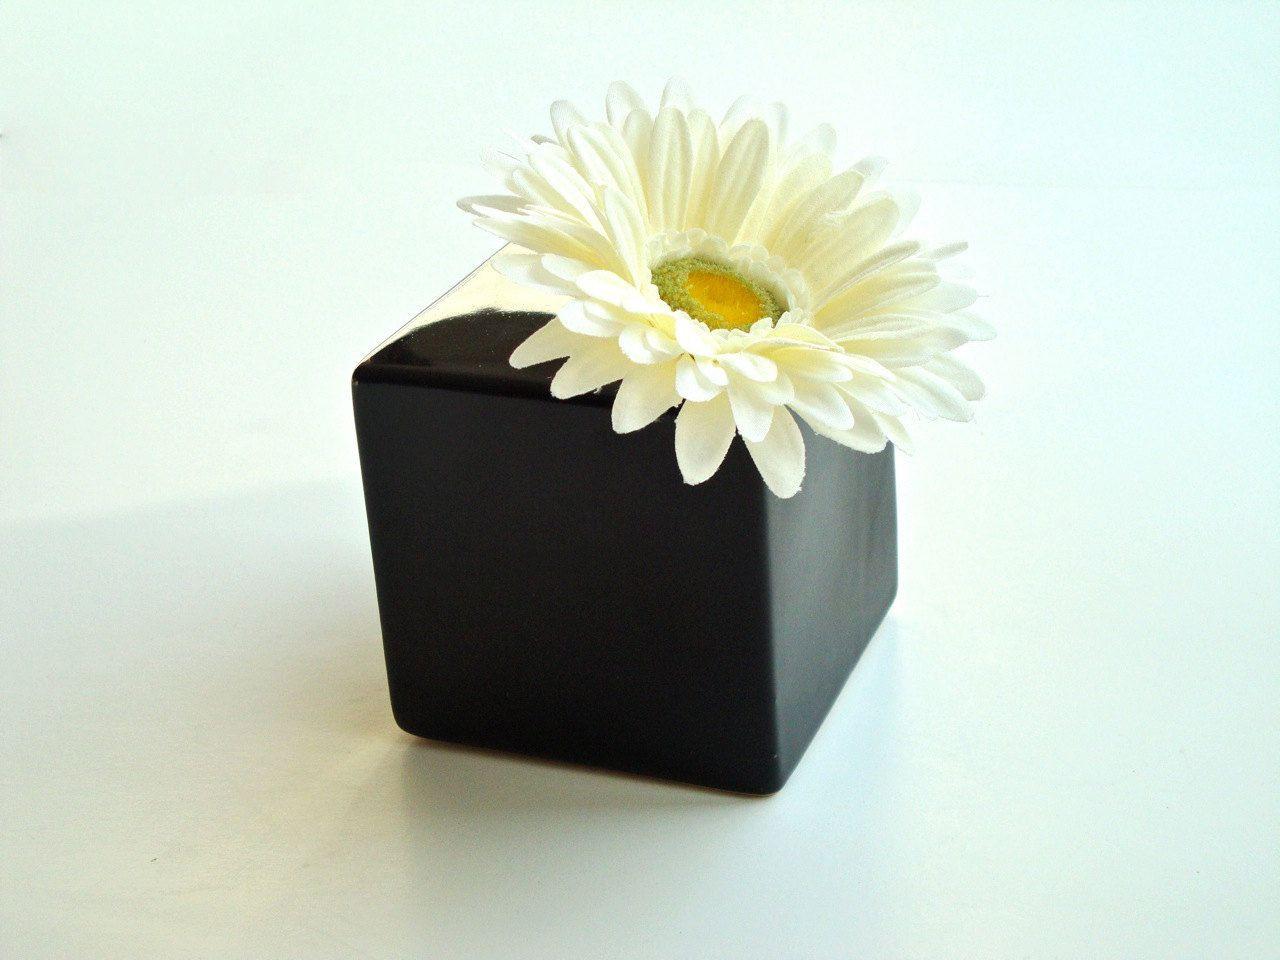 square bud vase of bud vase idea for black white theme spring tea ideas pinterest pertaining to bud vase idea for black white theme